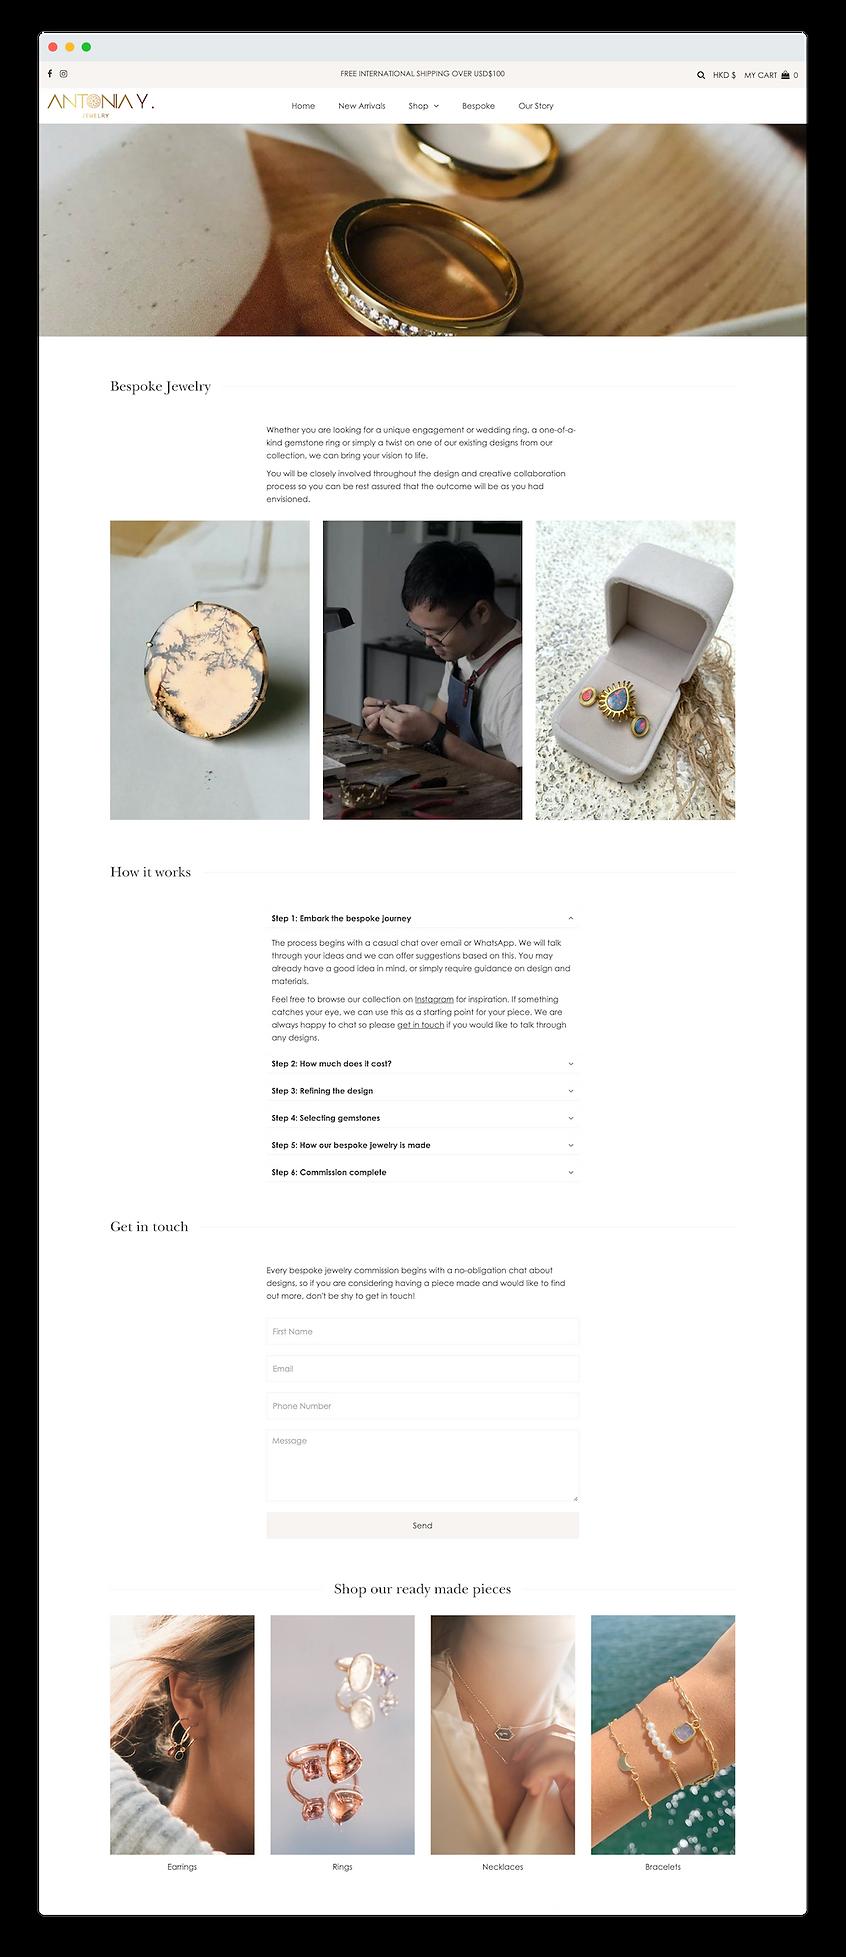 Antonia-Y-Jewelry-Bespoke-Page-Desktop.p